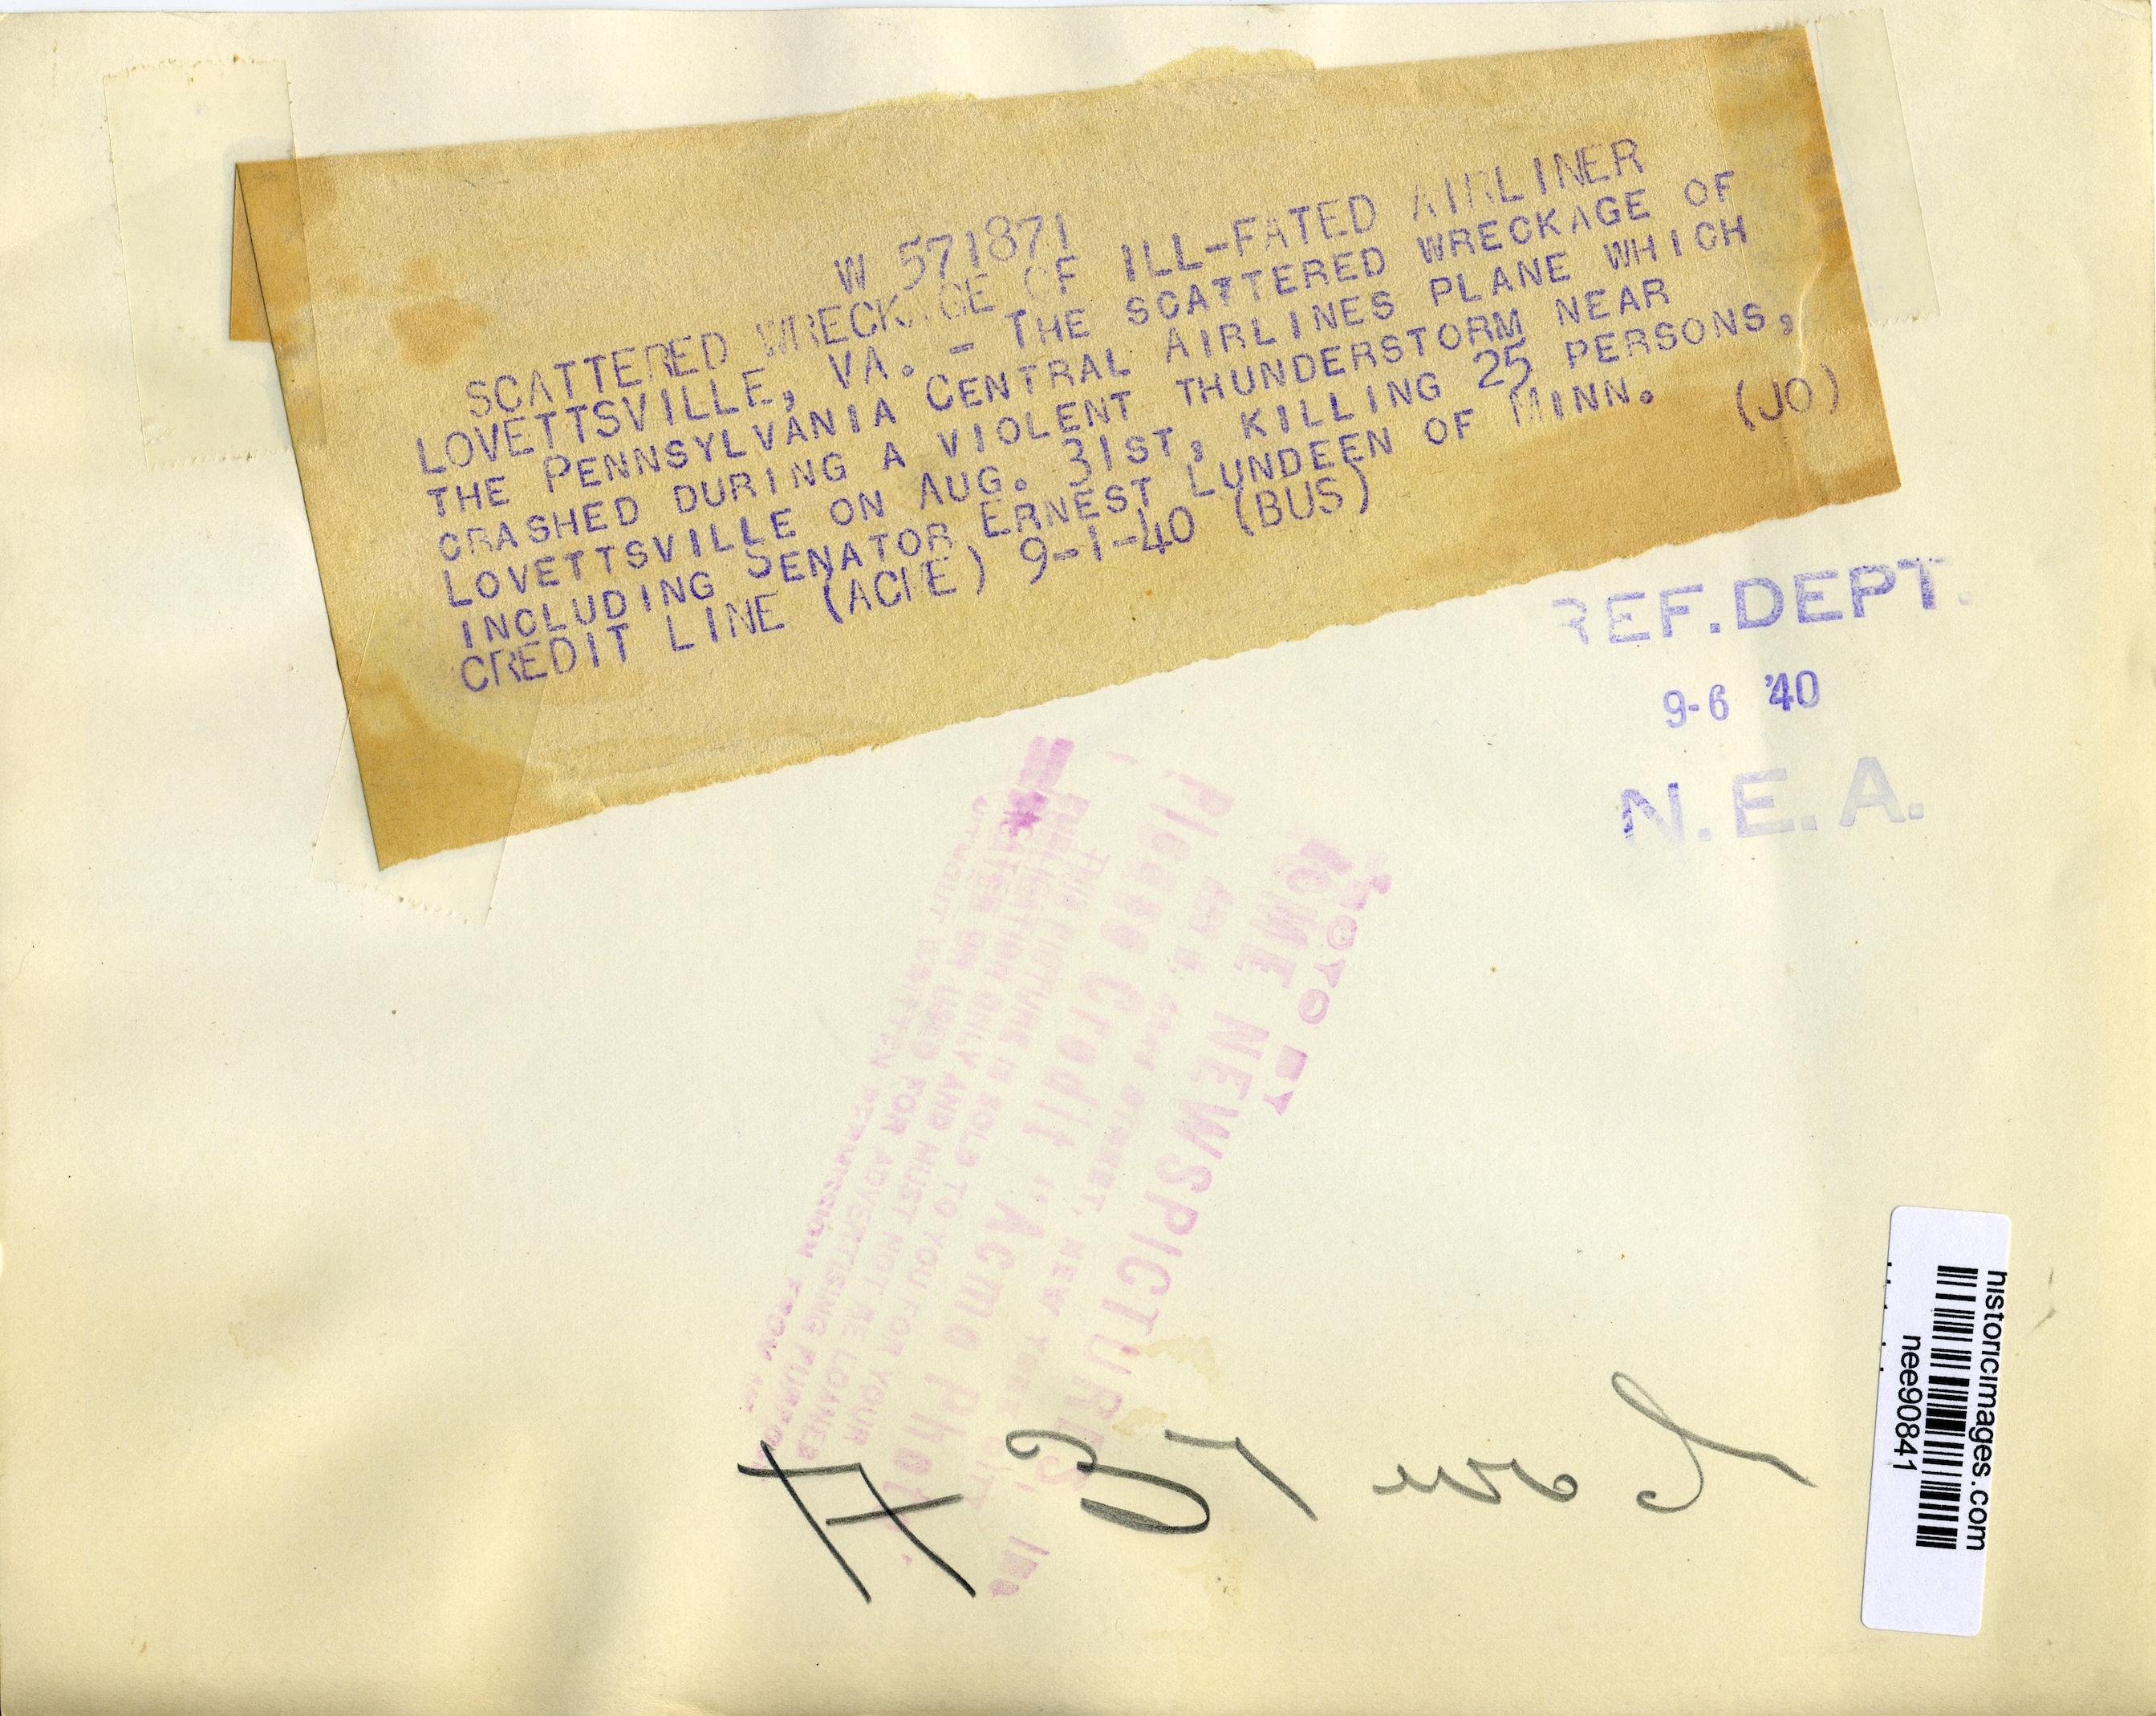 1940-lovettsville-air-crash-caption-300-dpi